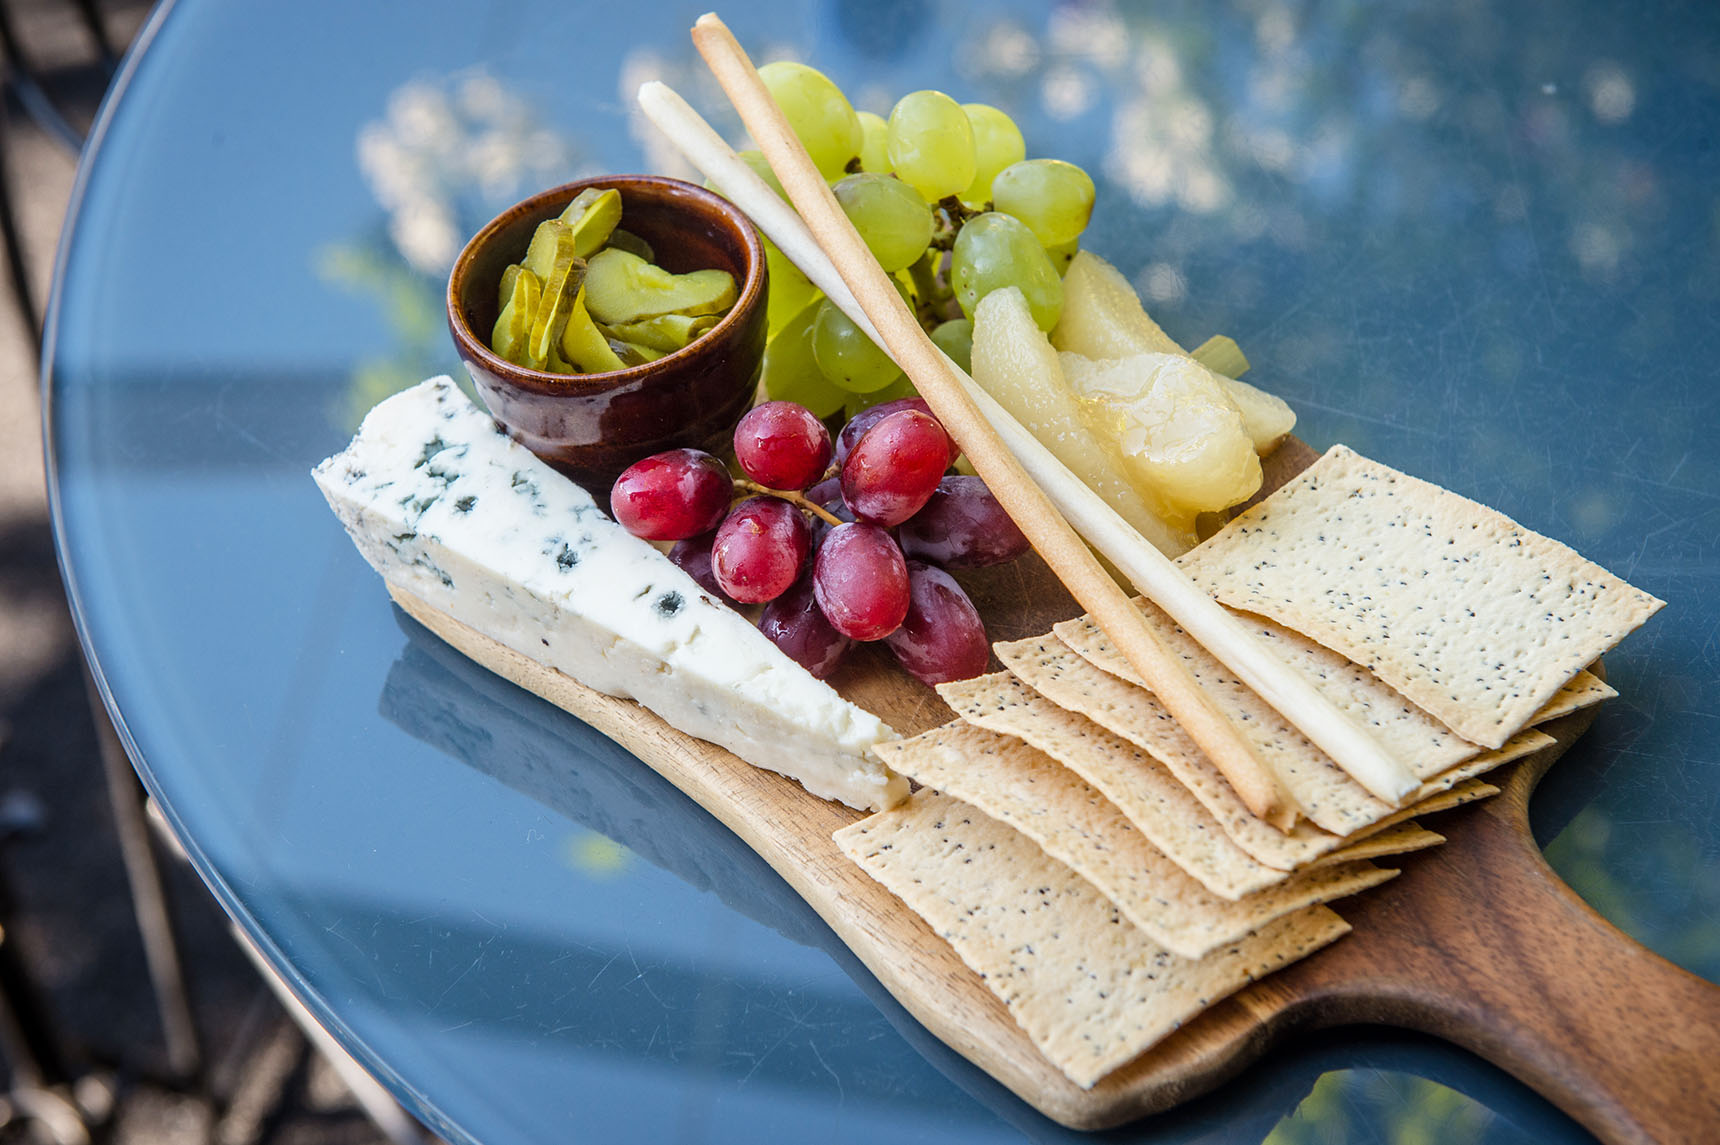 Loop Roof Food Menu Cheese Boards to share